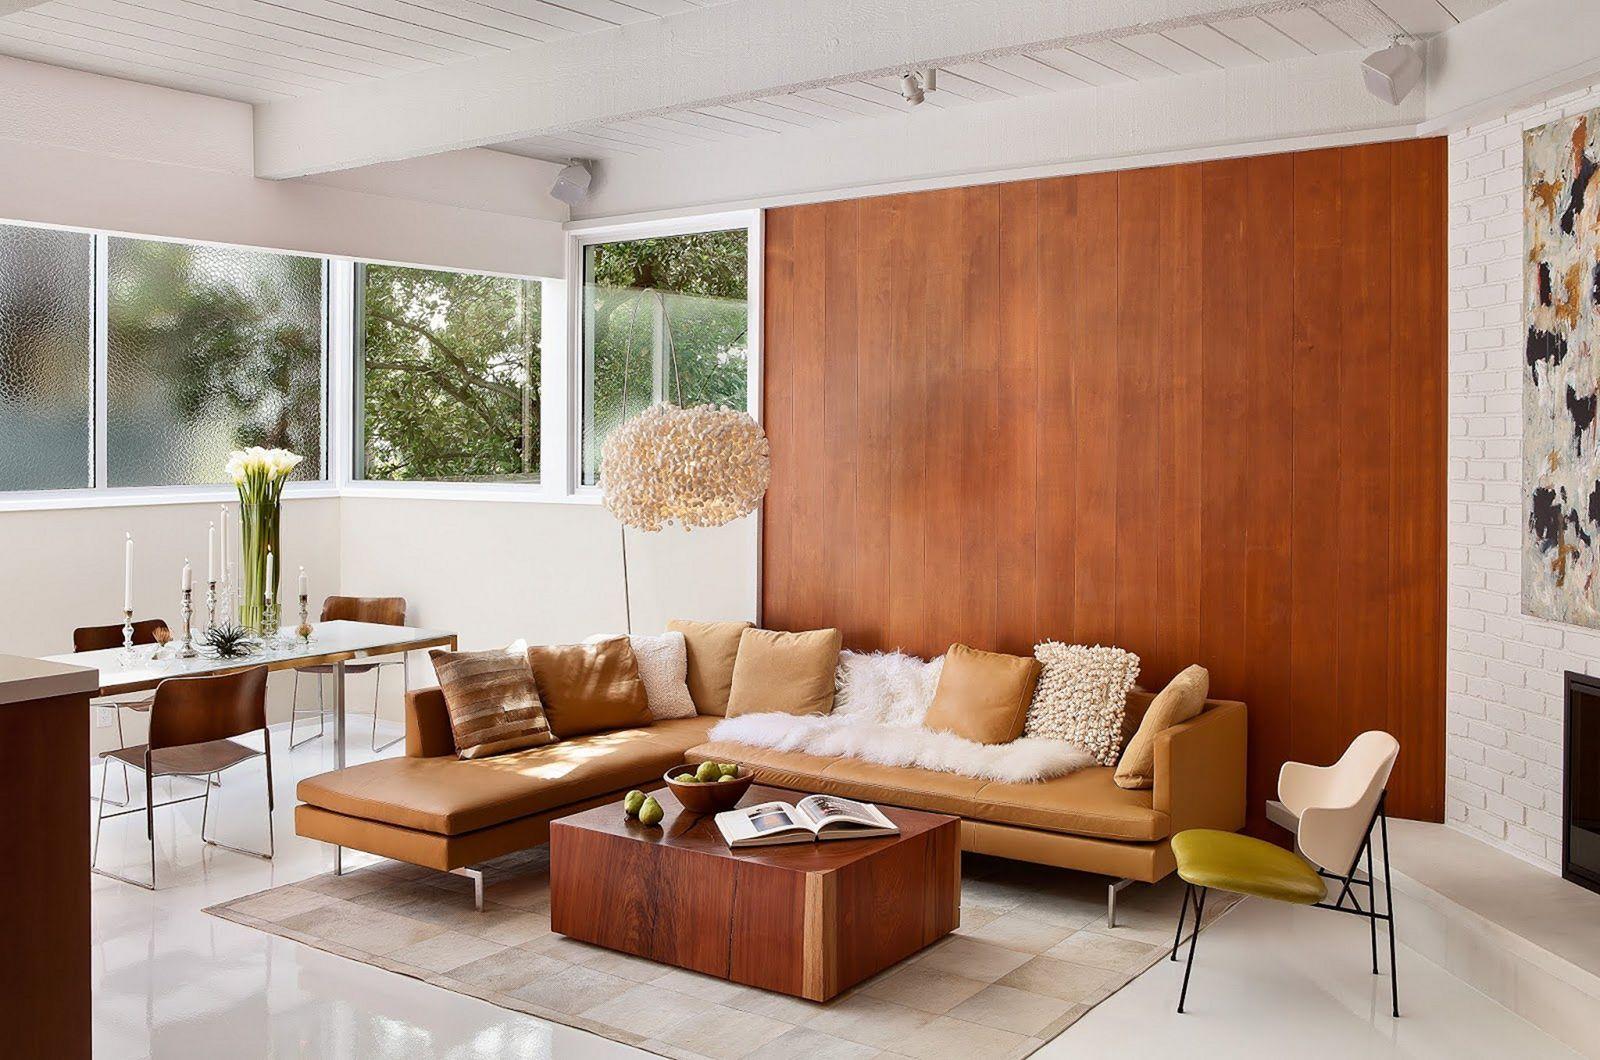 15 Astonishing Living Room Wood Wall Decoration Ideas In 2020 Mid Century Modern Living Room Modern Living Room Interior Mid Century Modern Living Room Furniture